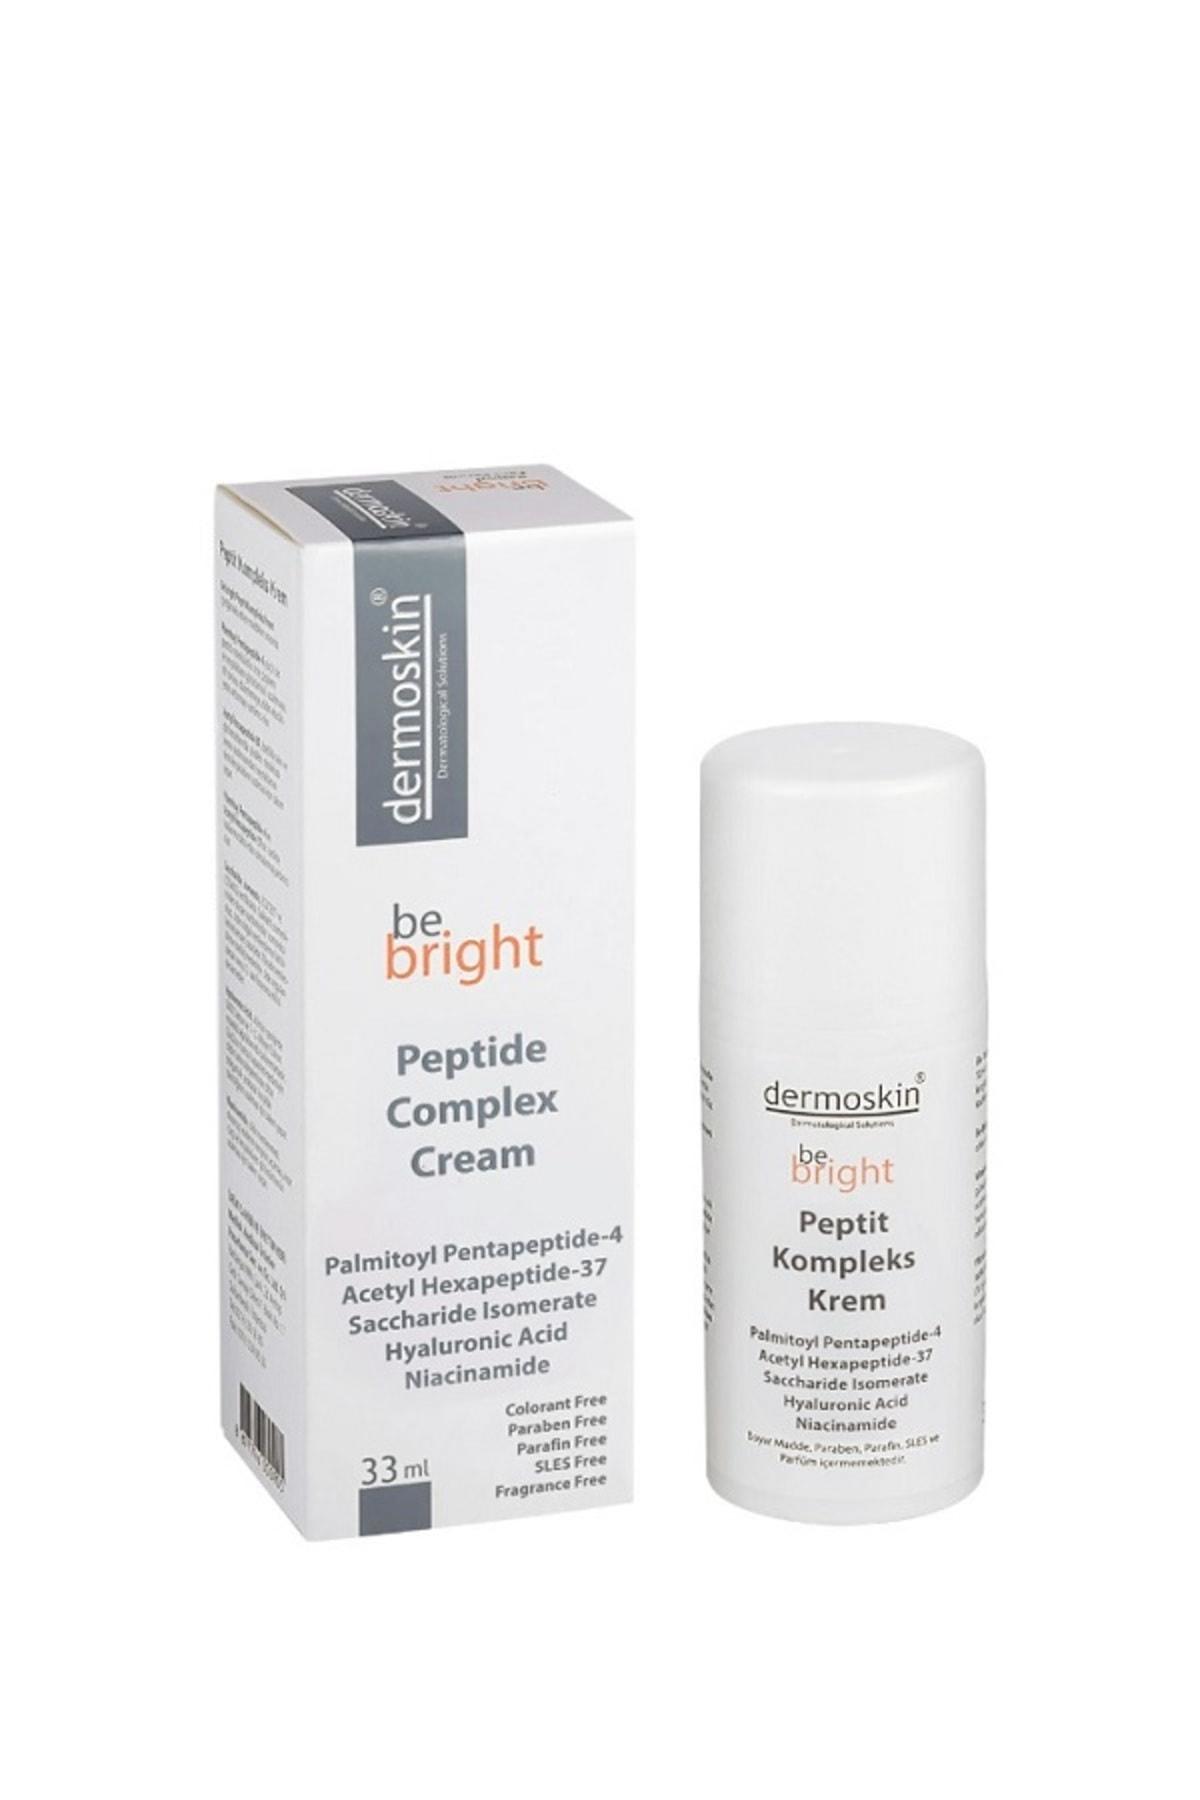 Dermoskin Be Bright Peptit Kompleks Krem 33 Ml 8697796000905 1